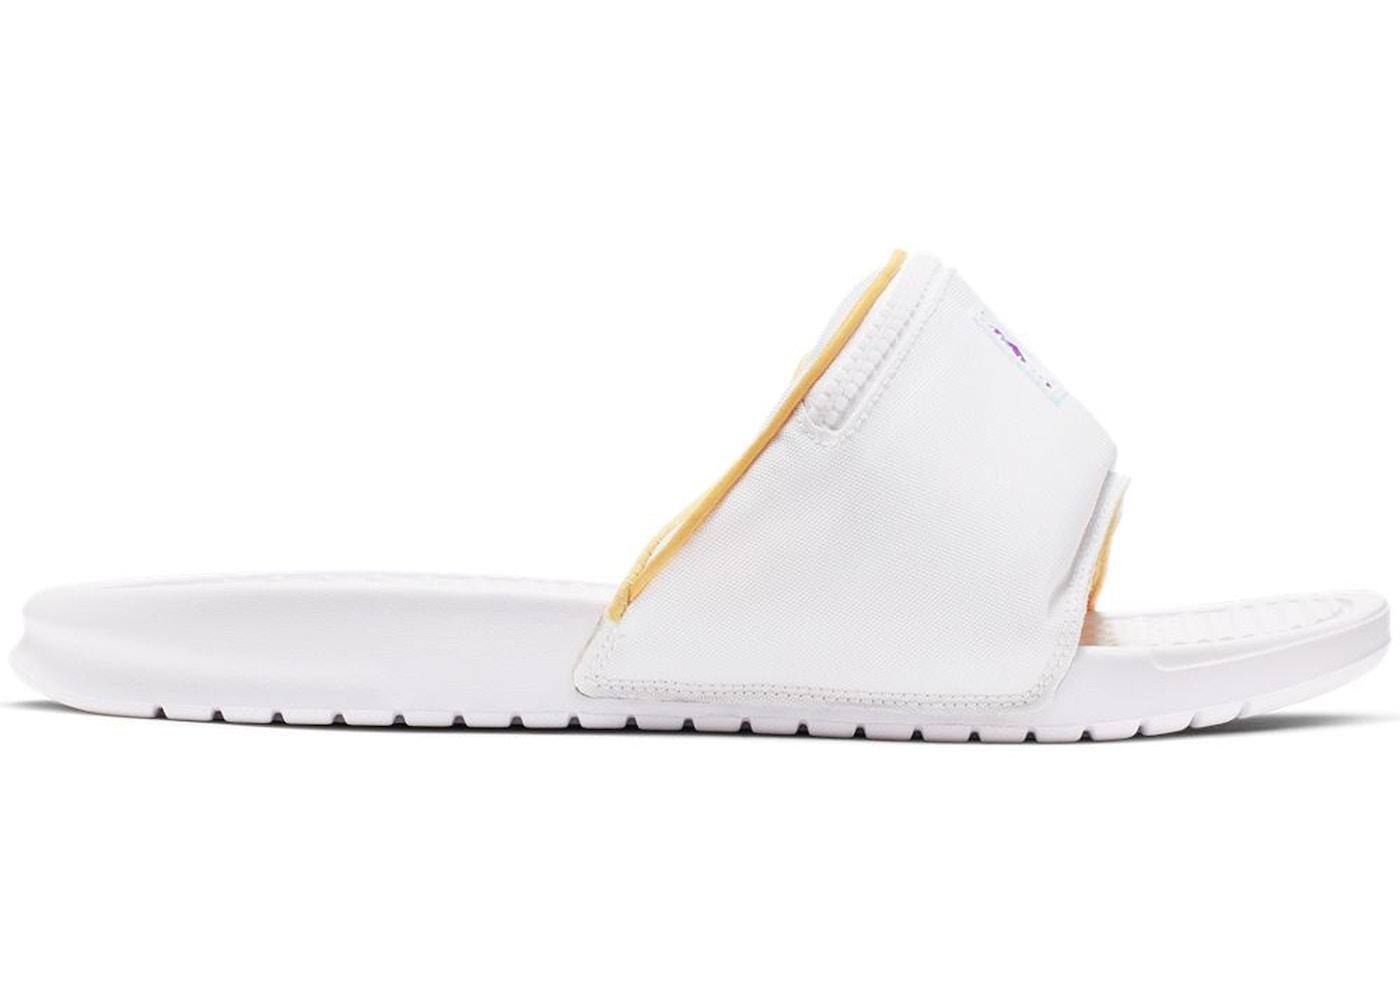 muy agradable Cromático Cap  Nike Benassi JDI Fanny Pack White Topaz Gold - CJ0604-100